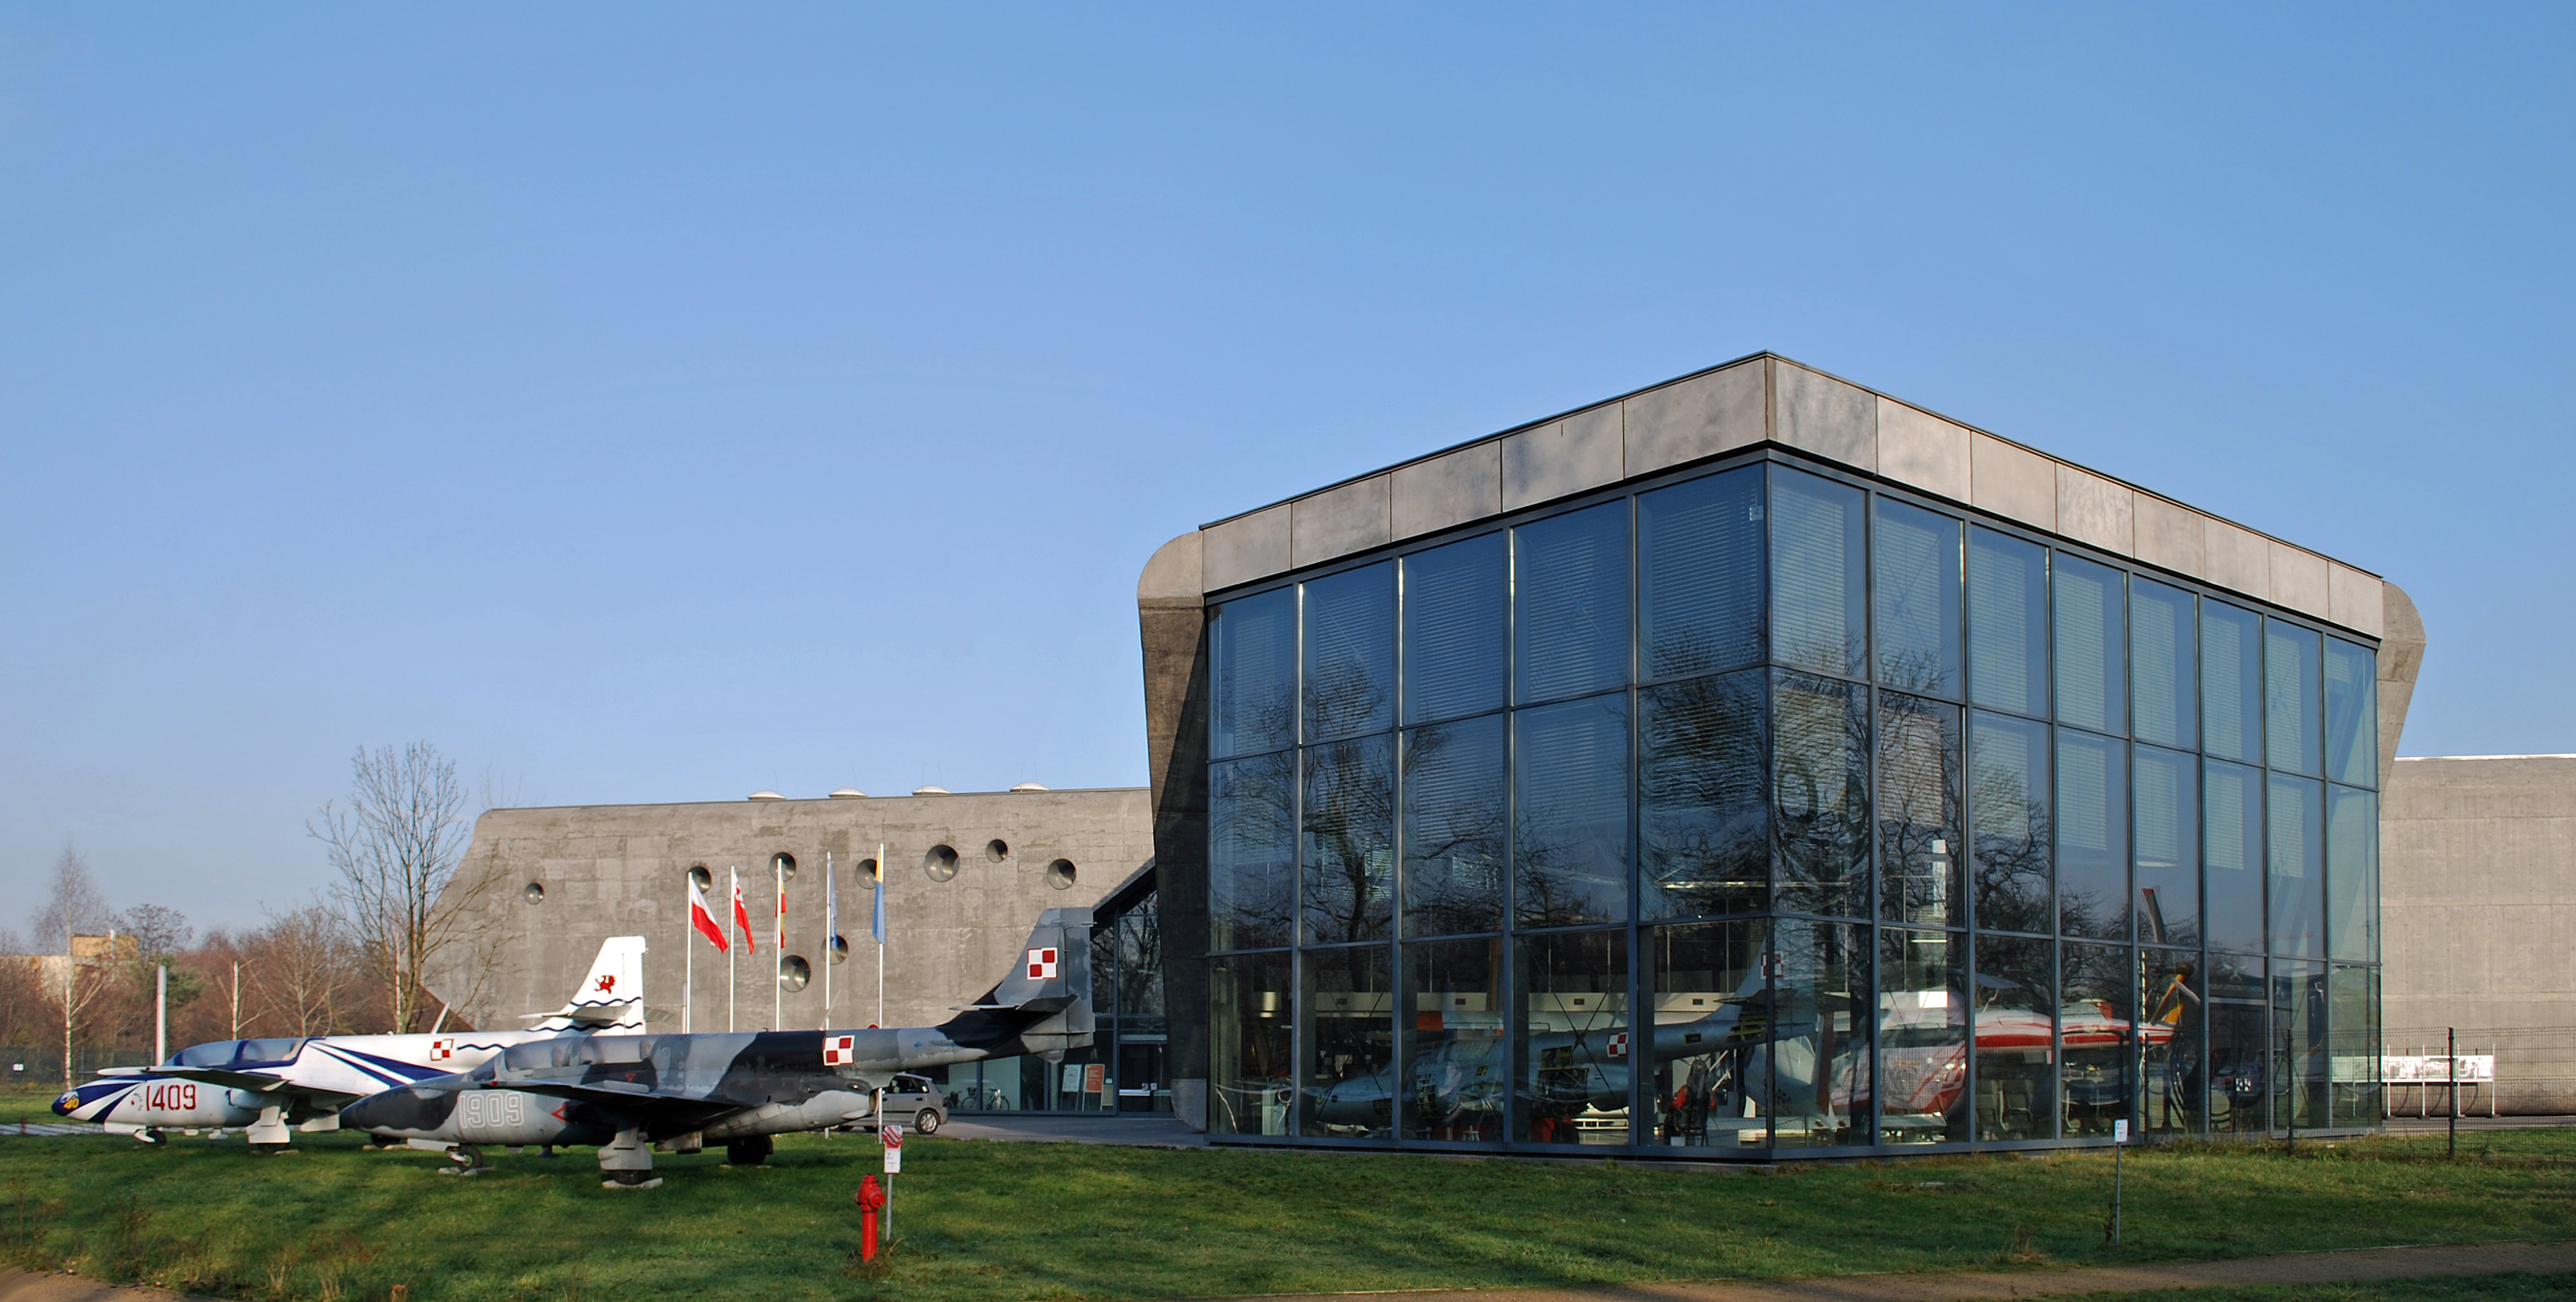 Polish Aviation Museum (Main Building, 2005 by arch. Bartlomiej Kisielewski), 39 John Paul II Av, Nowa Huta, Krakow, Poland